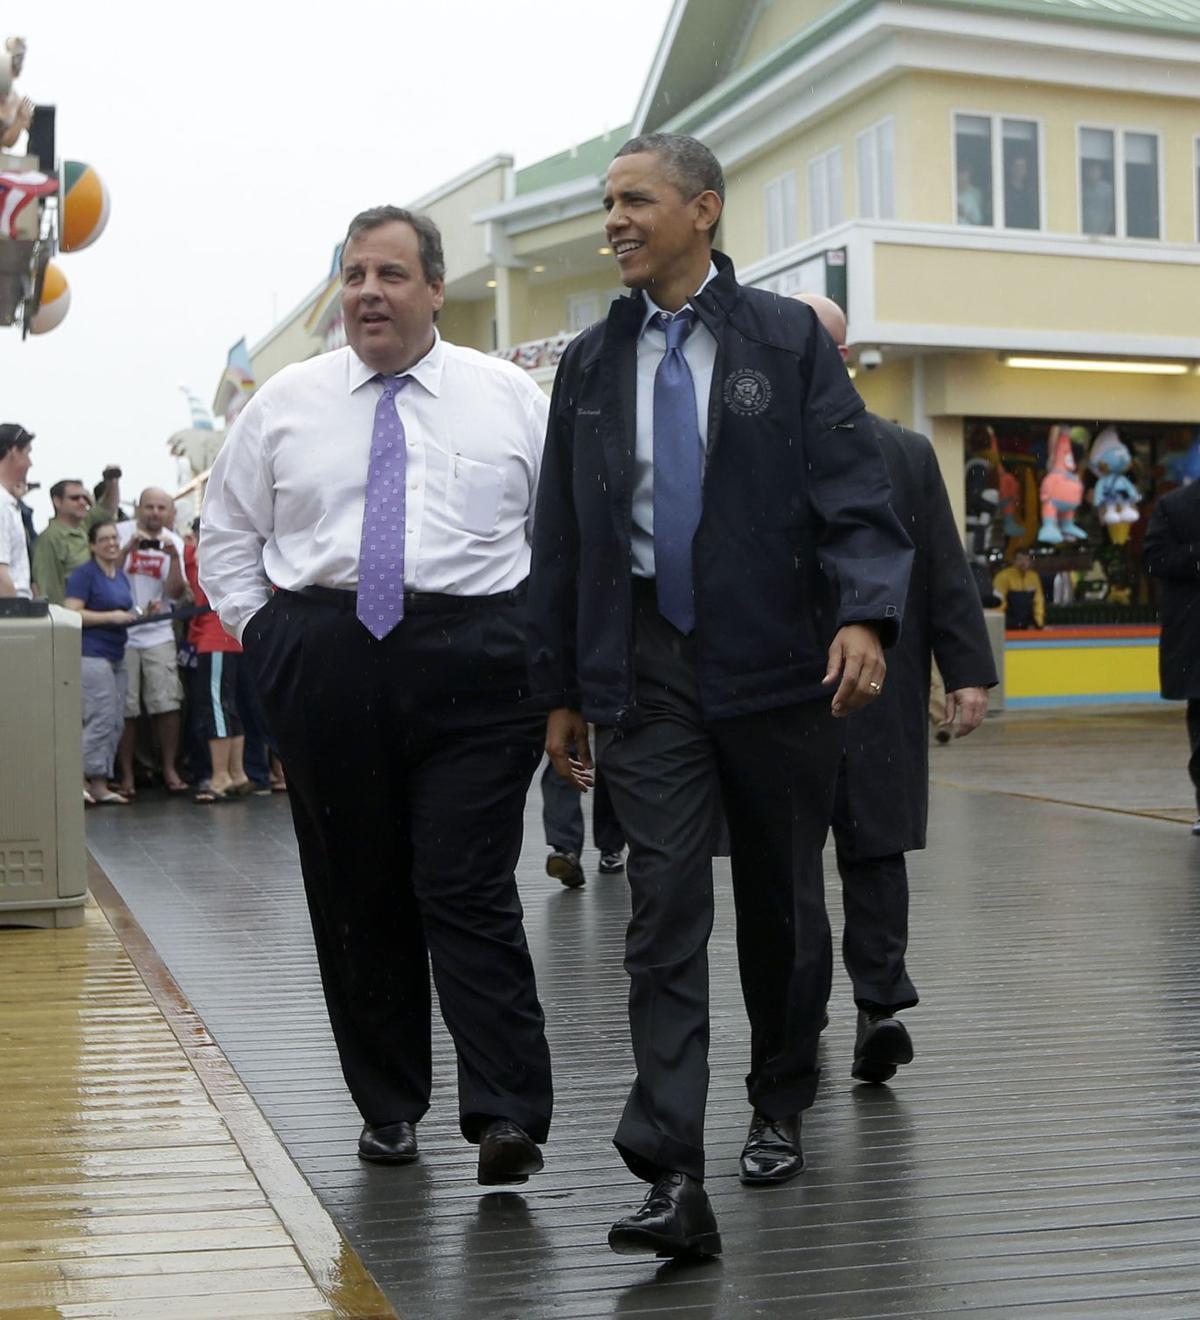 Obama, Christie back at it